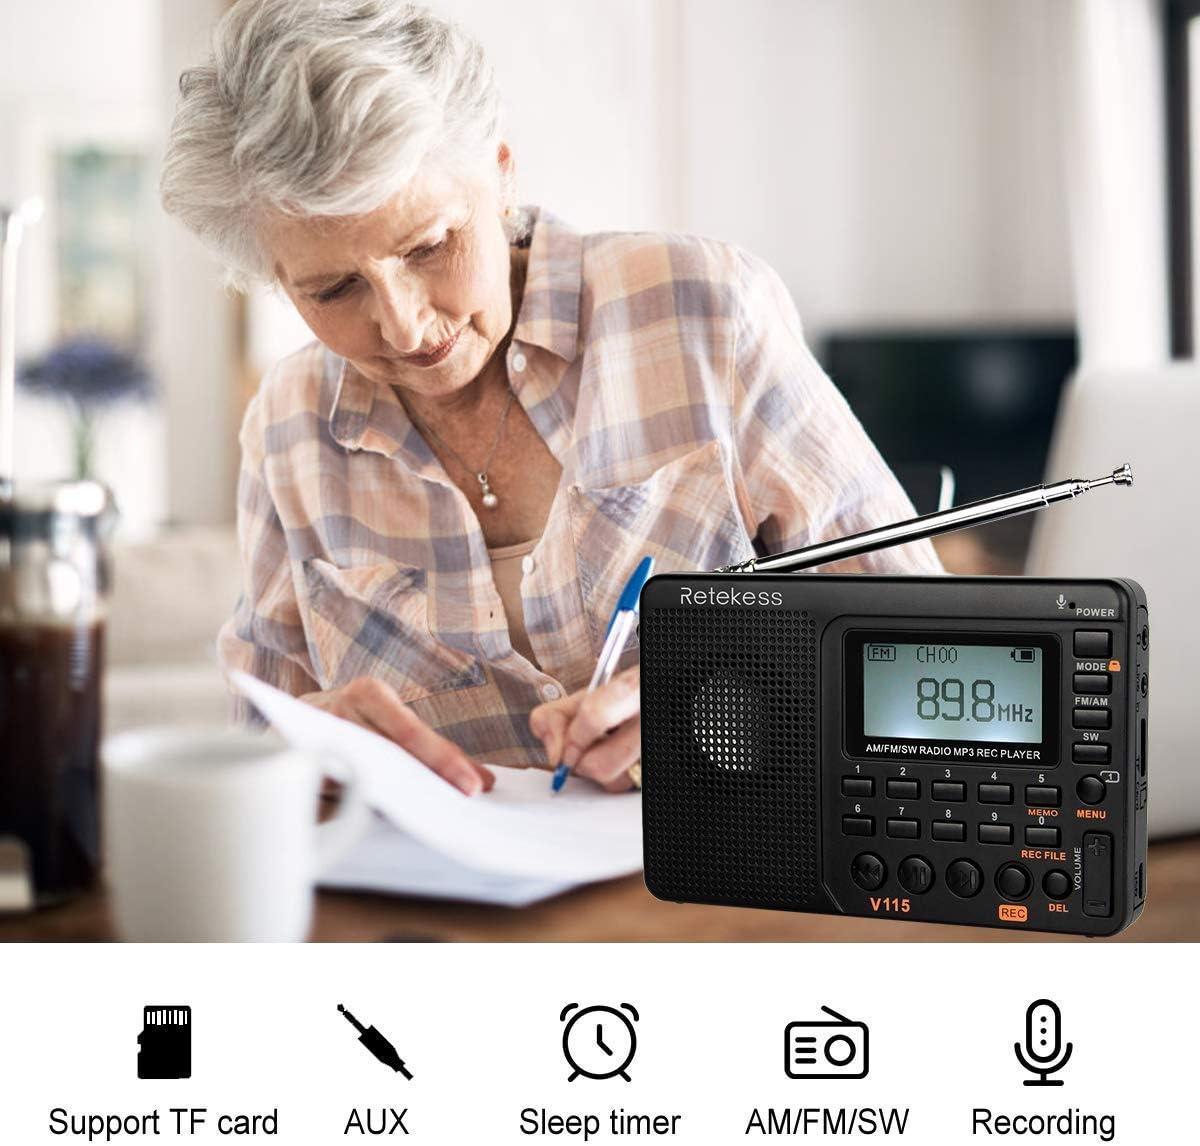 Small Radio AM FM Retekess V115 Portable Shortwave Radio V111 Shortwave Radio with Best Reception World Band Radio Receiver Digital Radio Battery Powered Compact Radio AM FM